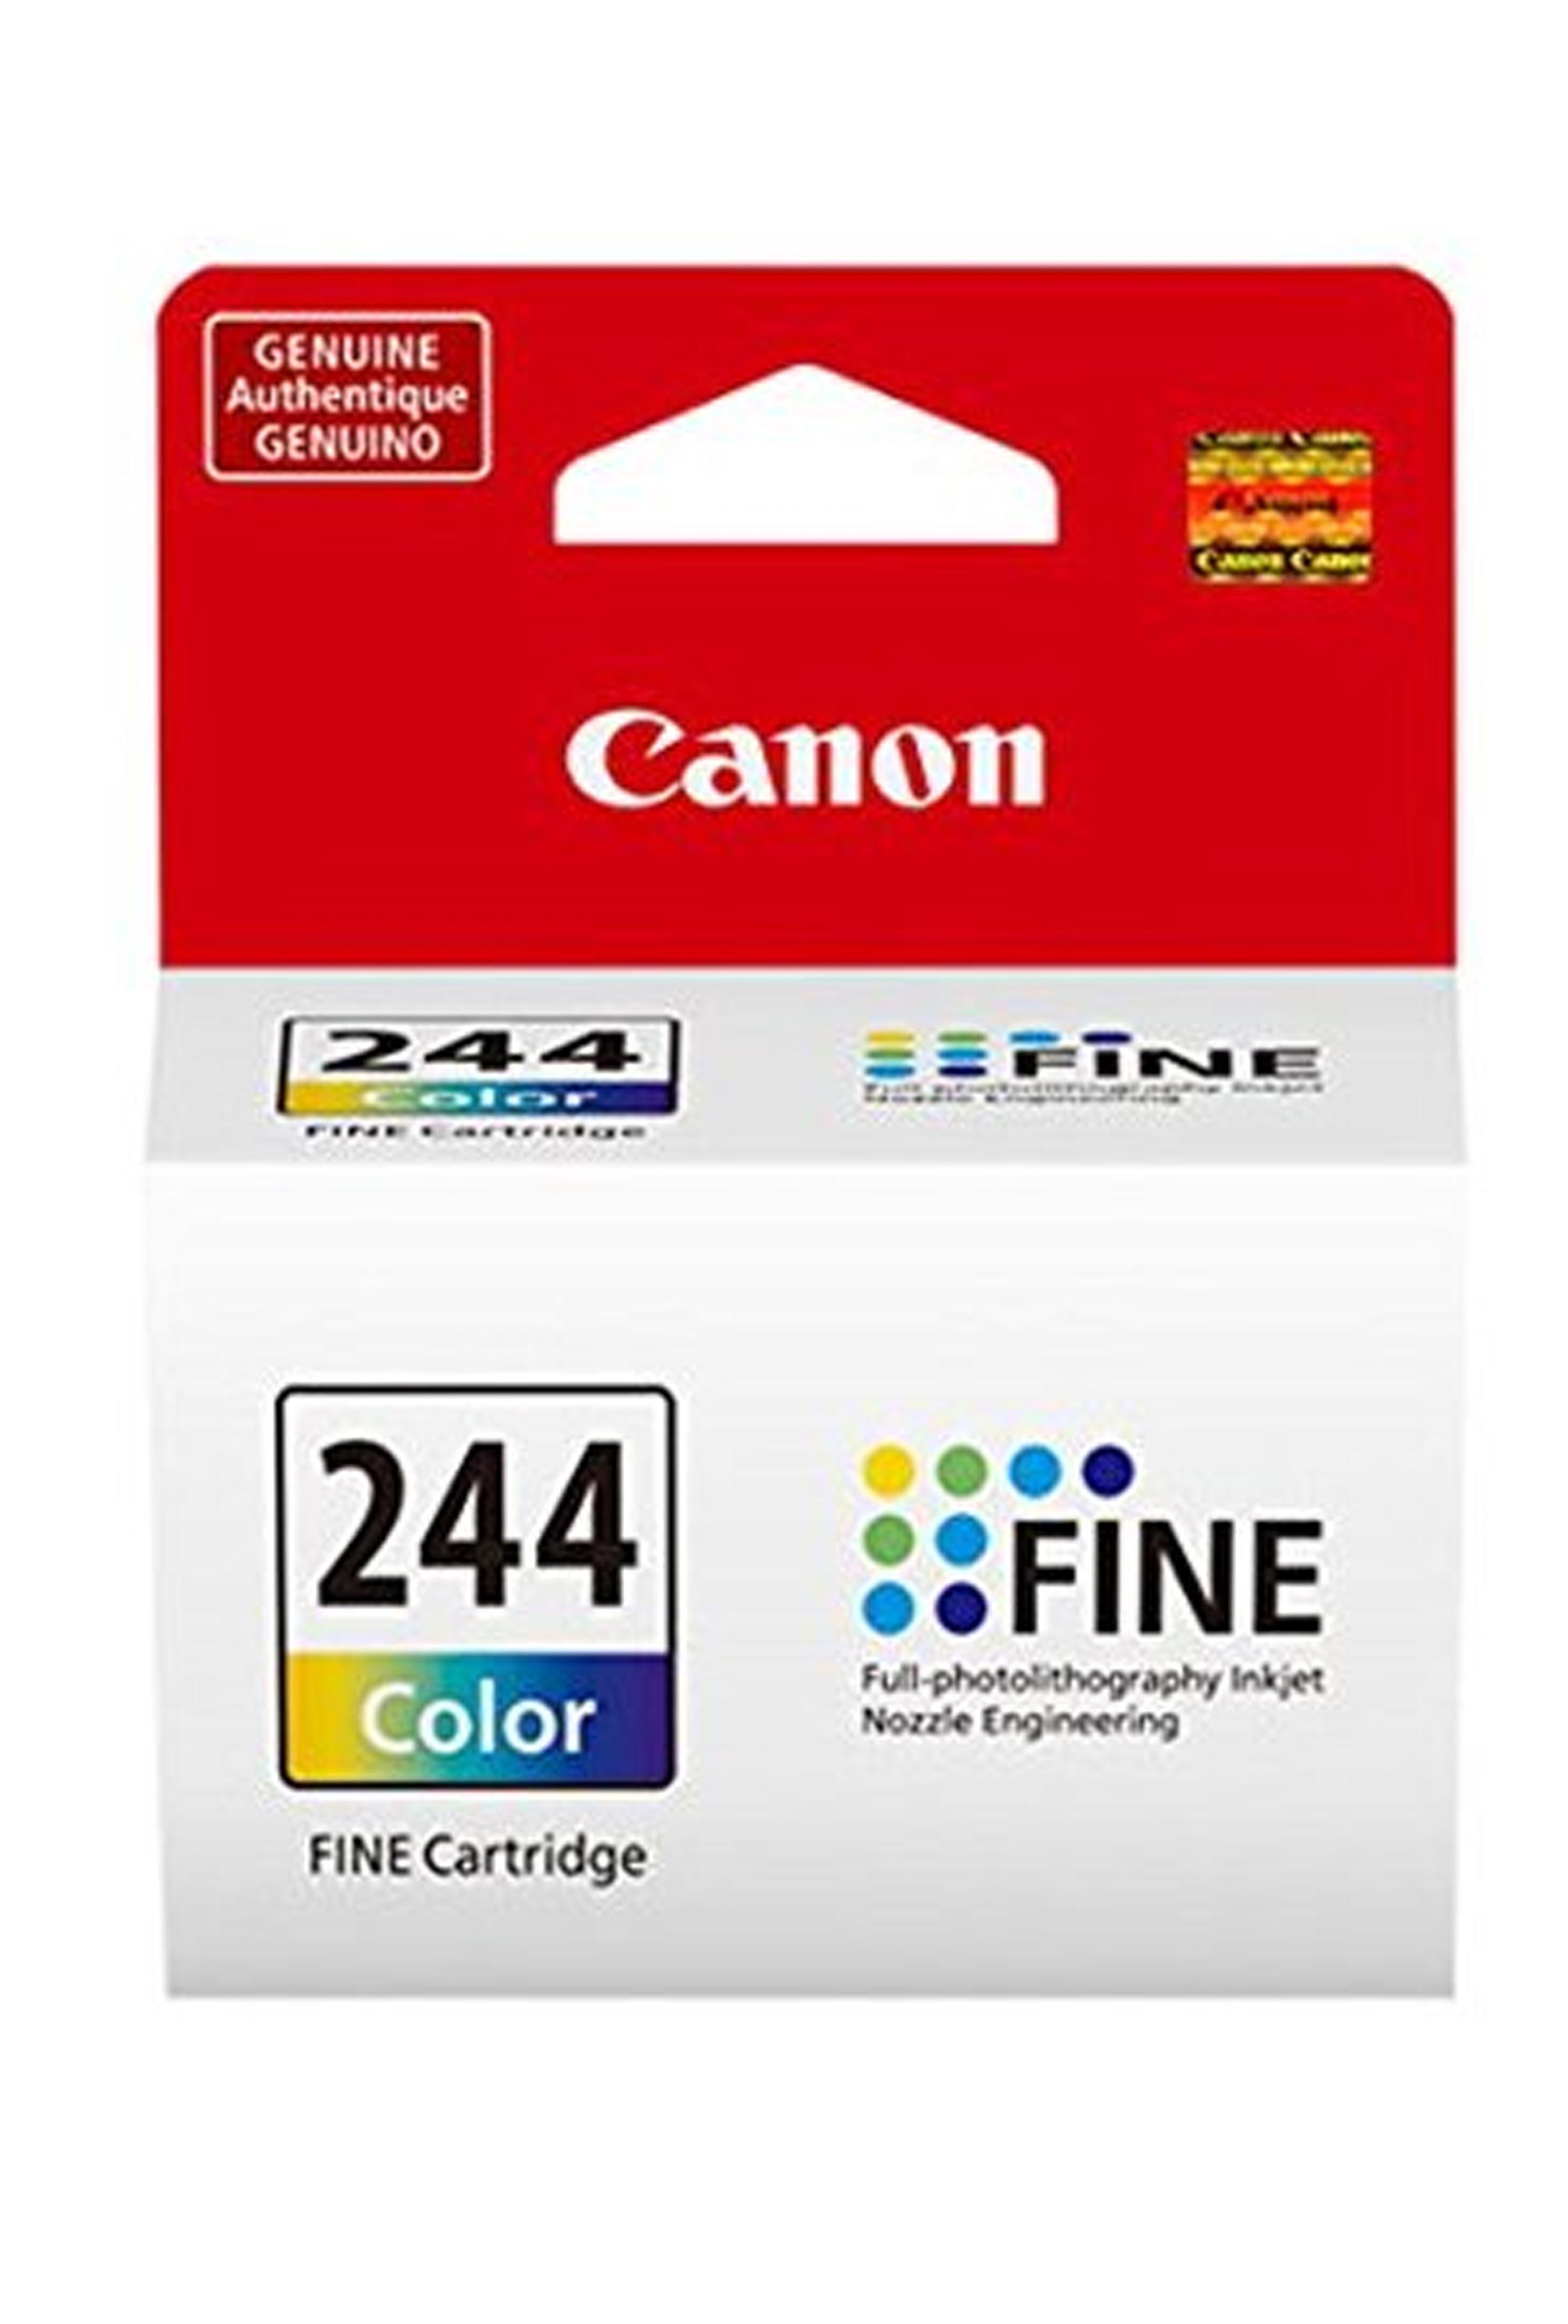 Canon CL-244 Color Ink Cartridge (1288C001)